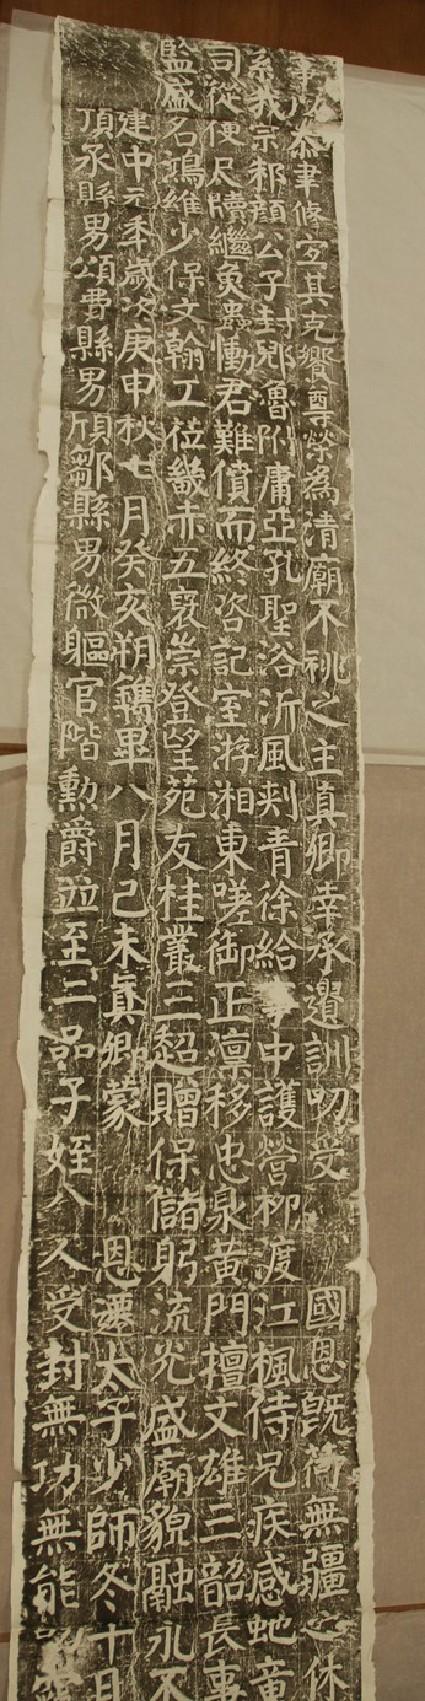 Stele of Yan Family Shrine